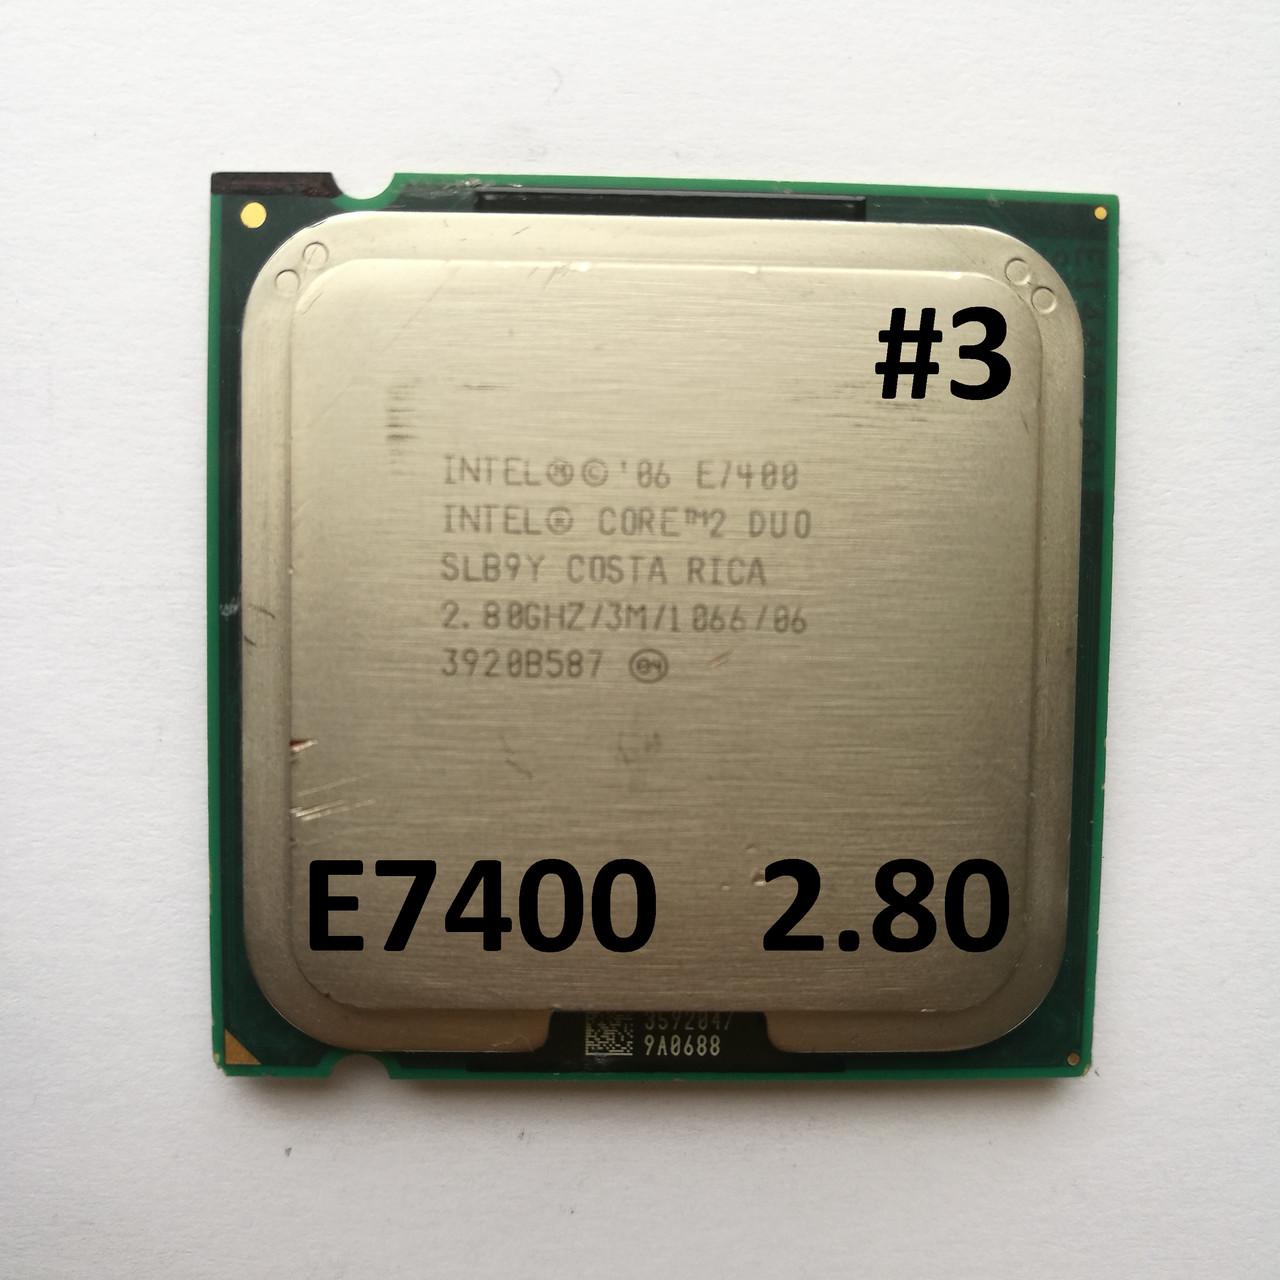 Процессор ЛОТ#3 Intel® Core™2 Duo E7400 R0 SLB9Y 2.80GHz 3M Cache 1066 MHz FSB Socket 775 Б/У